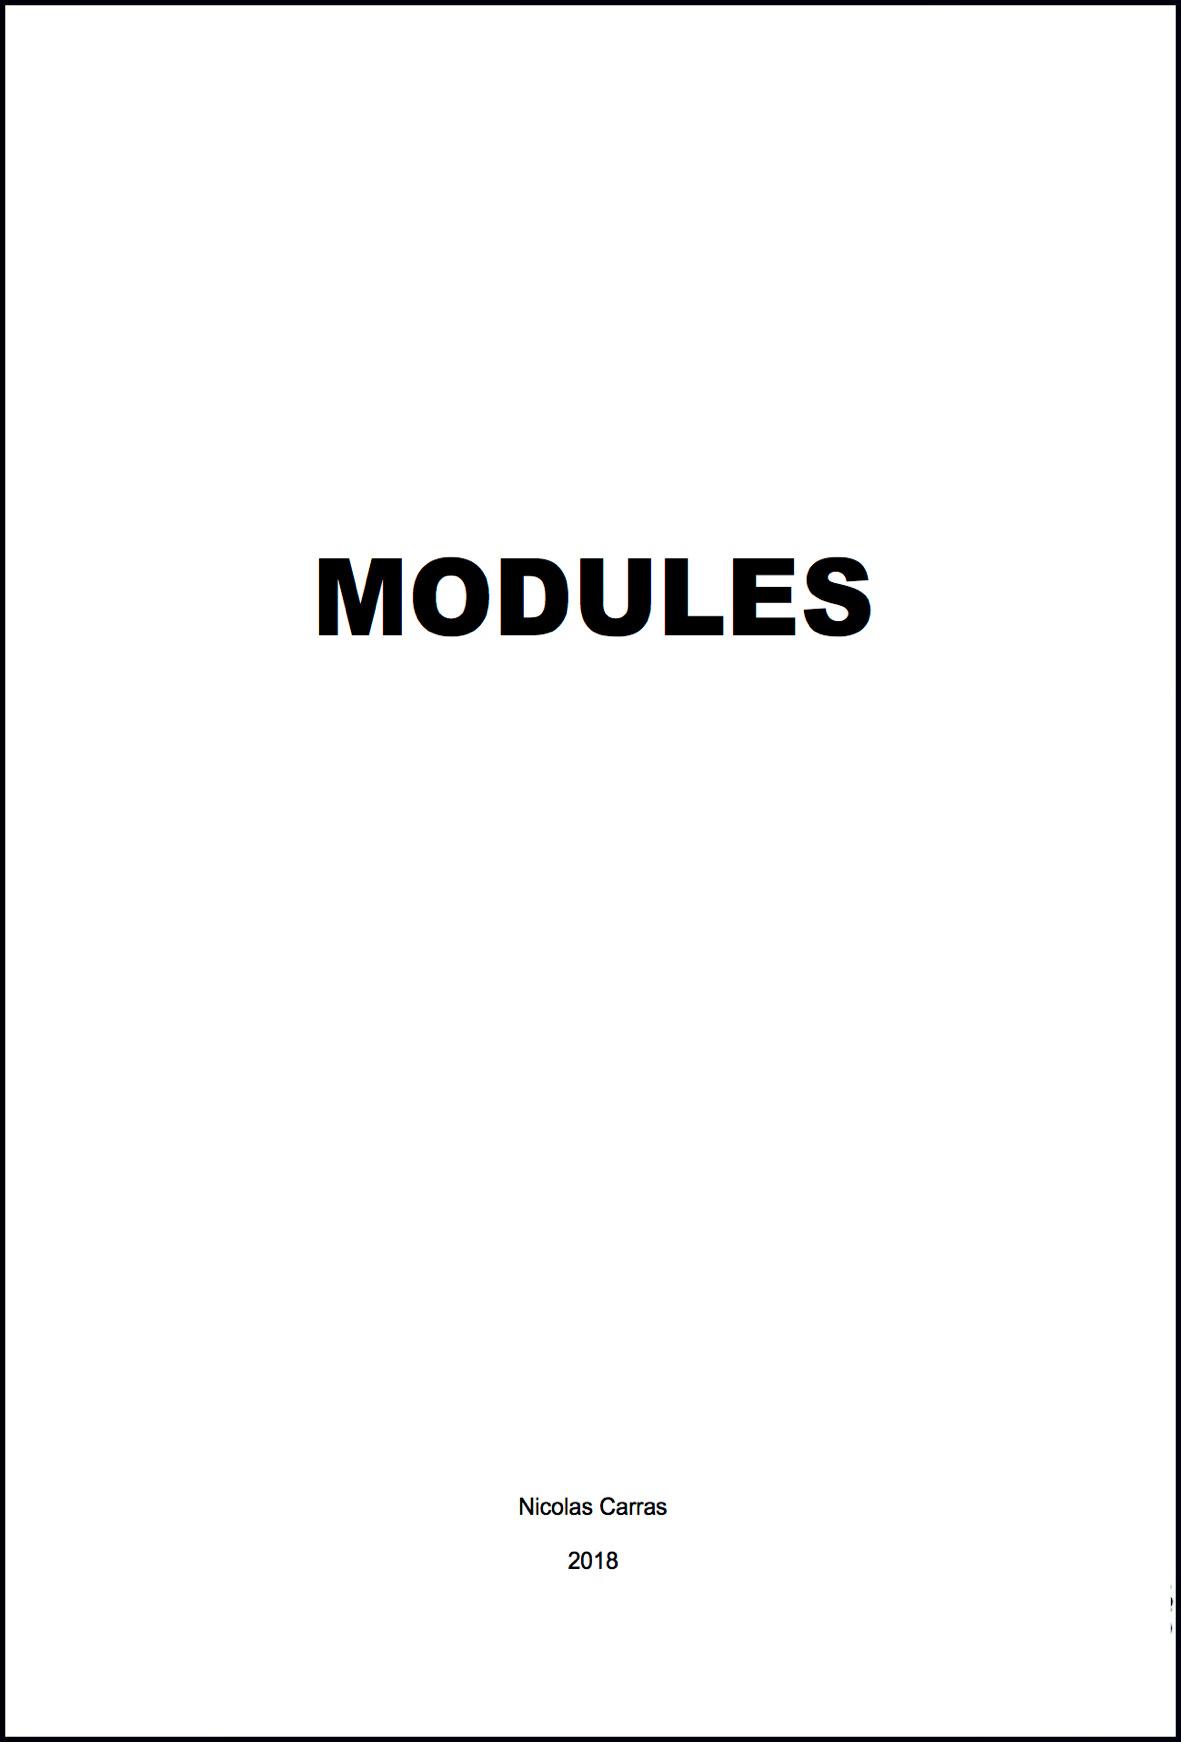 © Nicolas Carras - Modules